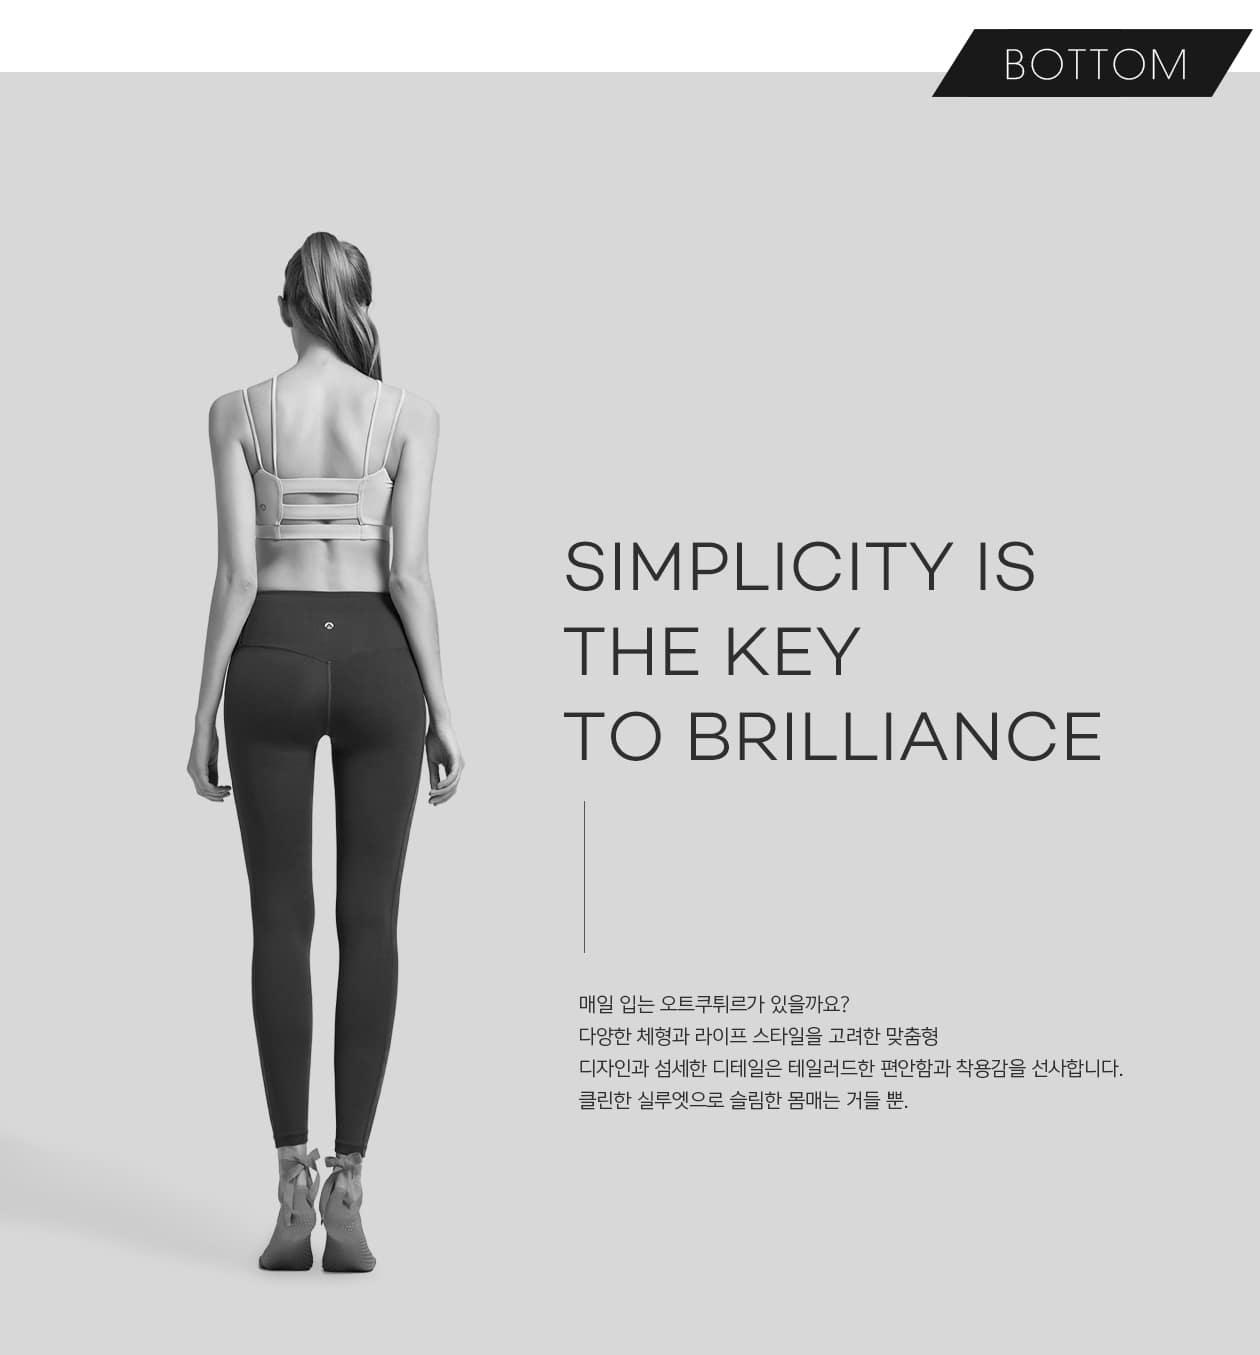 SIMPLICITY IS THE KEY TO BRILLIANCE 매일 입는 오트쿠튀르가 있을까요? 다양한 체형과 라이프스타일을 고려한 맞춤형디자인과 섬세한 디테일은 테일러드한 편안함과 착용감을 선사합니다. 클린한 실루엣으로 슬림한 몸매는 거들 뿐.